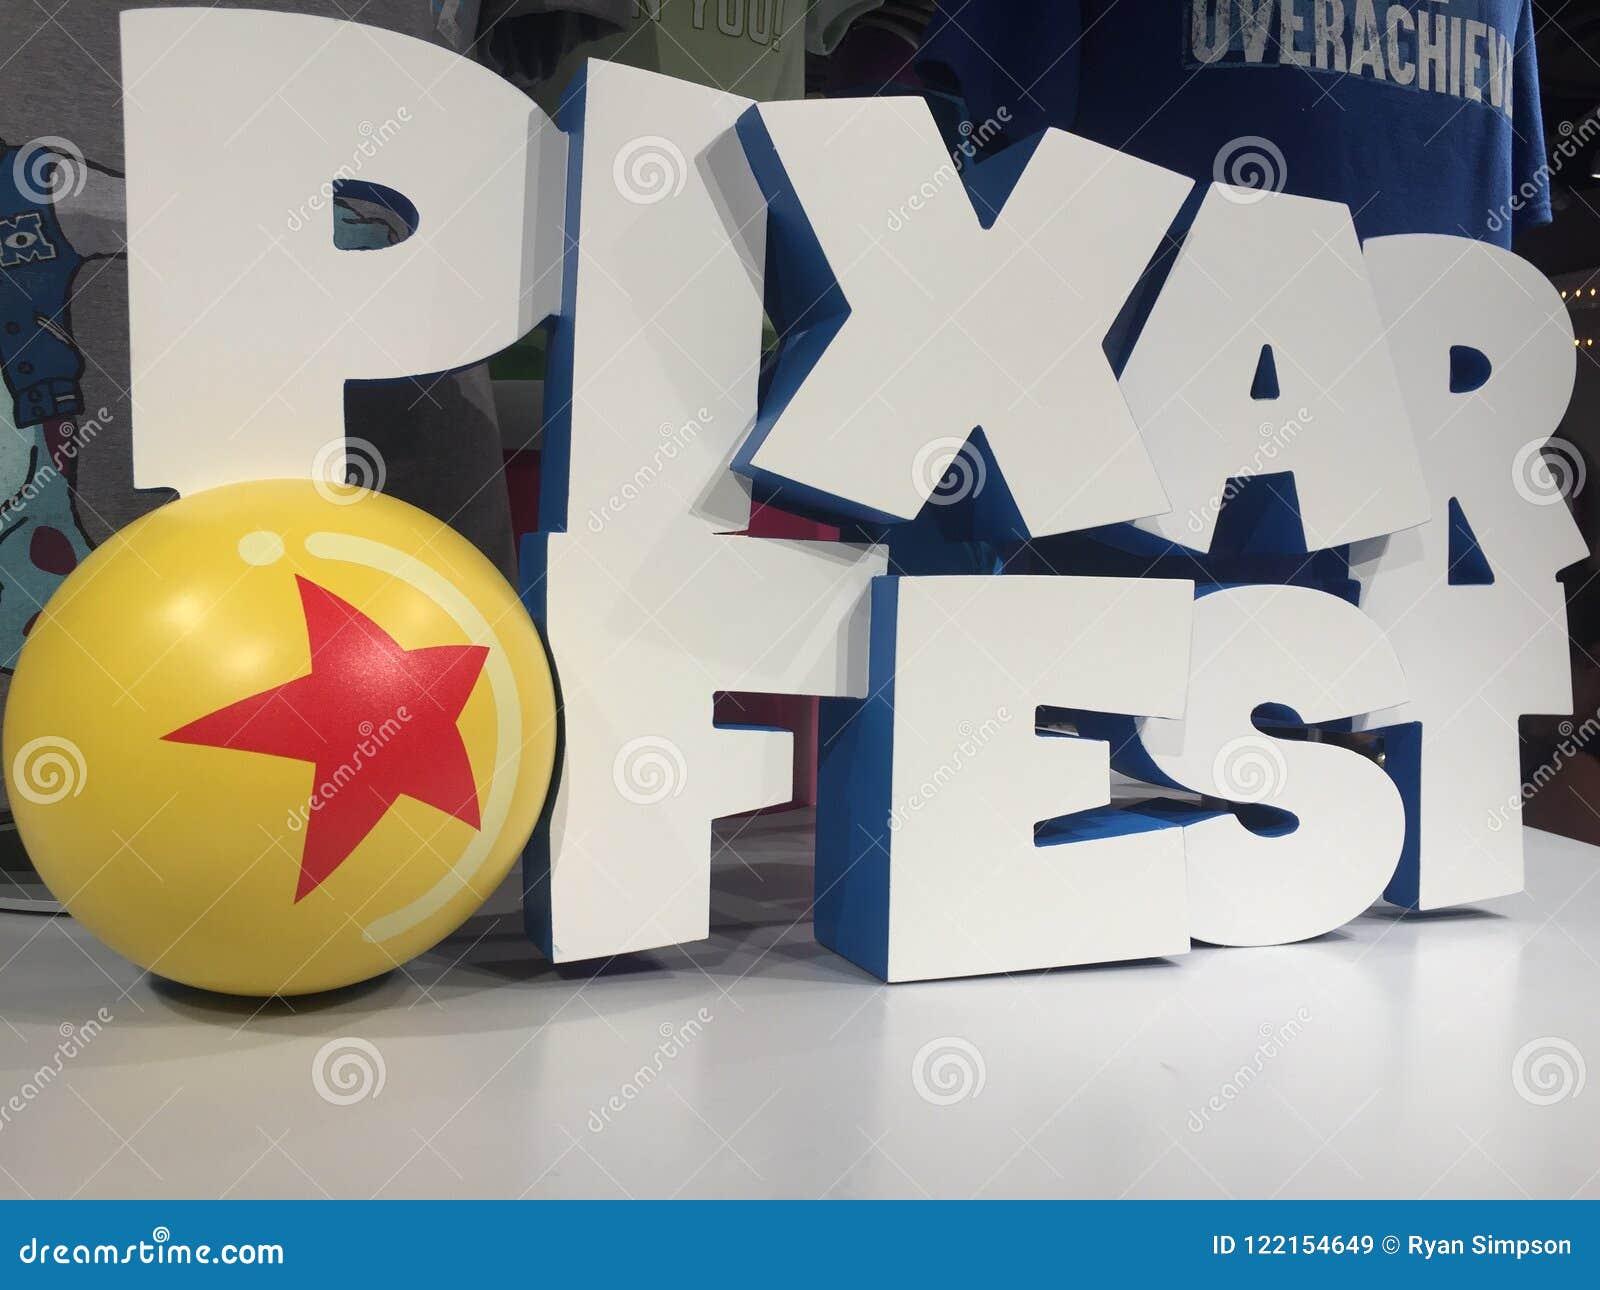 Pixar Fest 3d Logo In Disneyland Shop California Editorial Stock